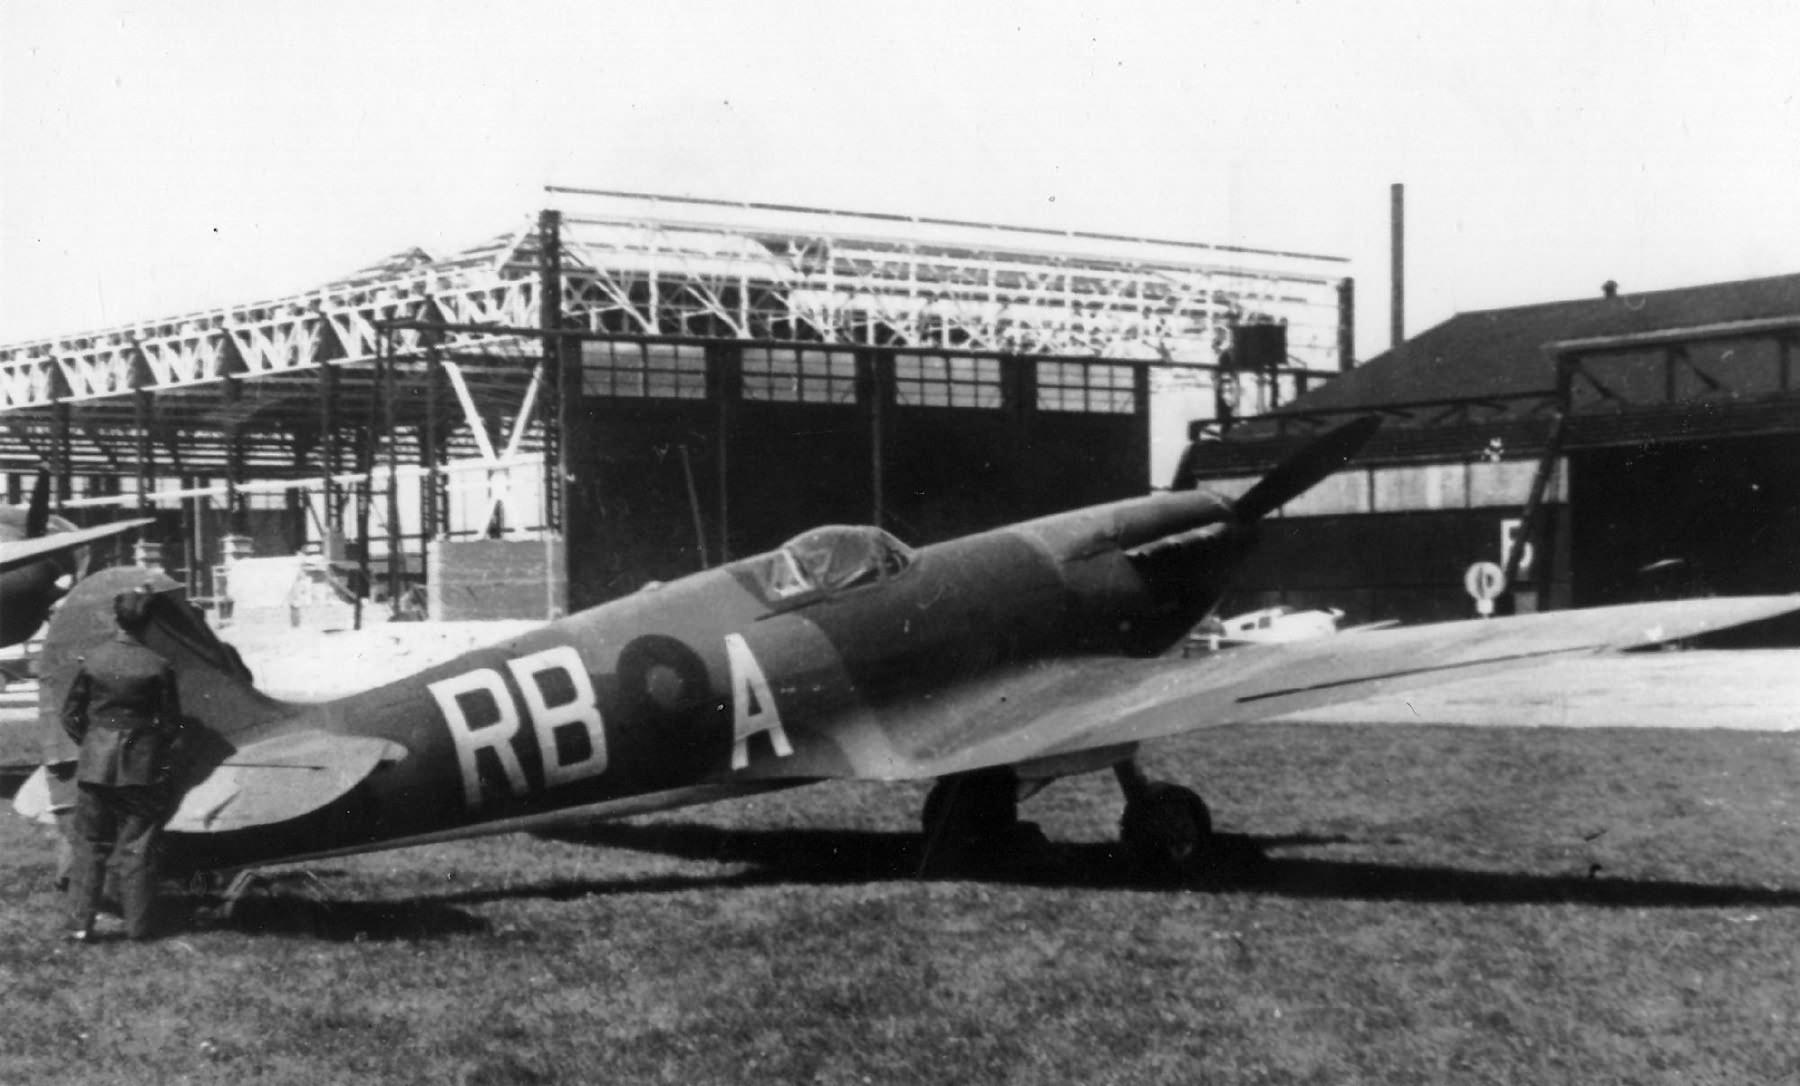 Spitfire MkI RAF 66Sqn RBA K9806 with twin blade propellor England 1940 England 1940 web 01